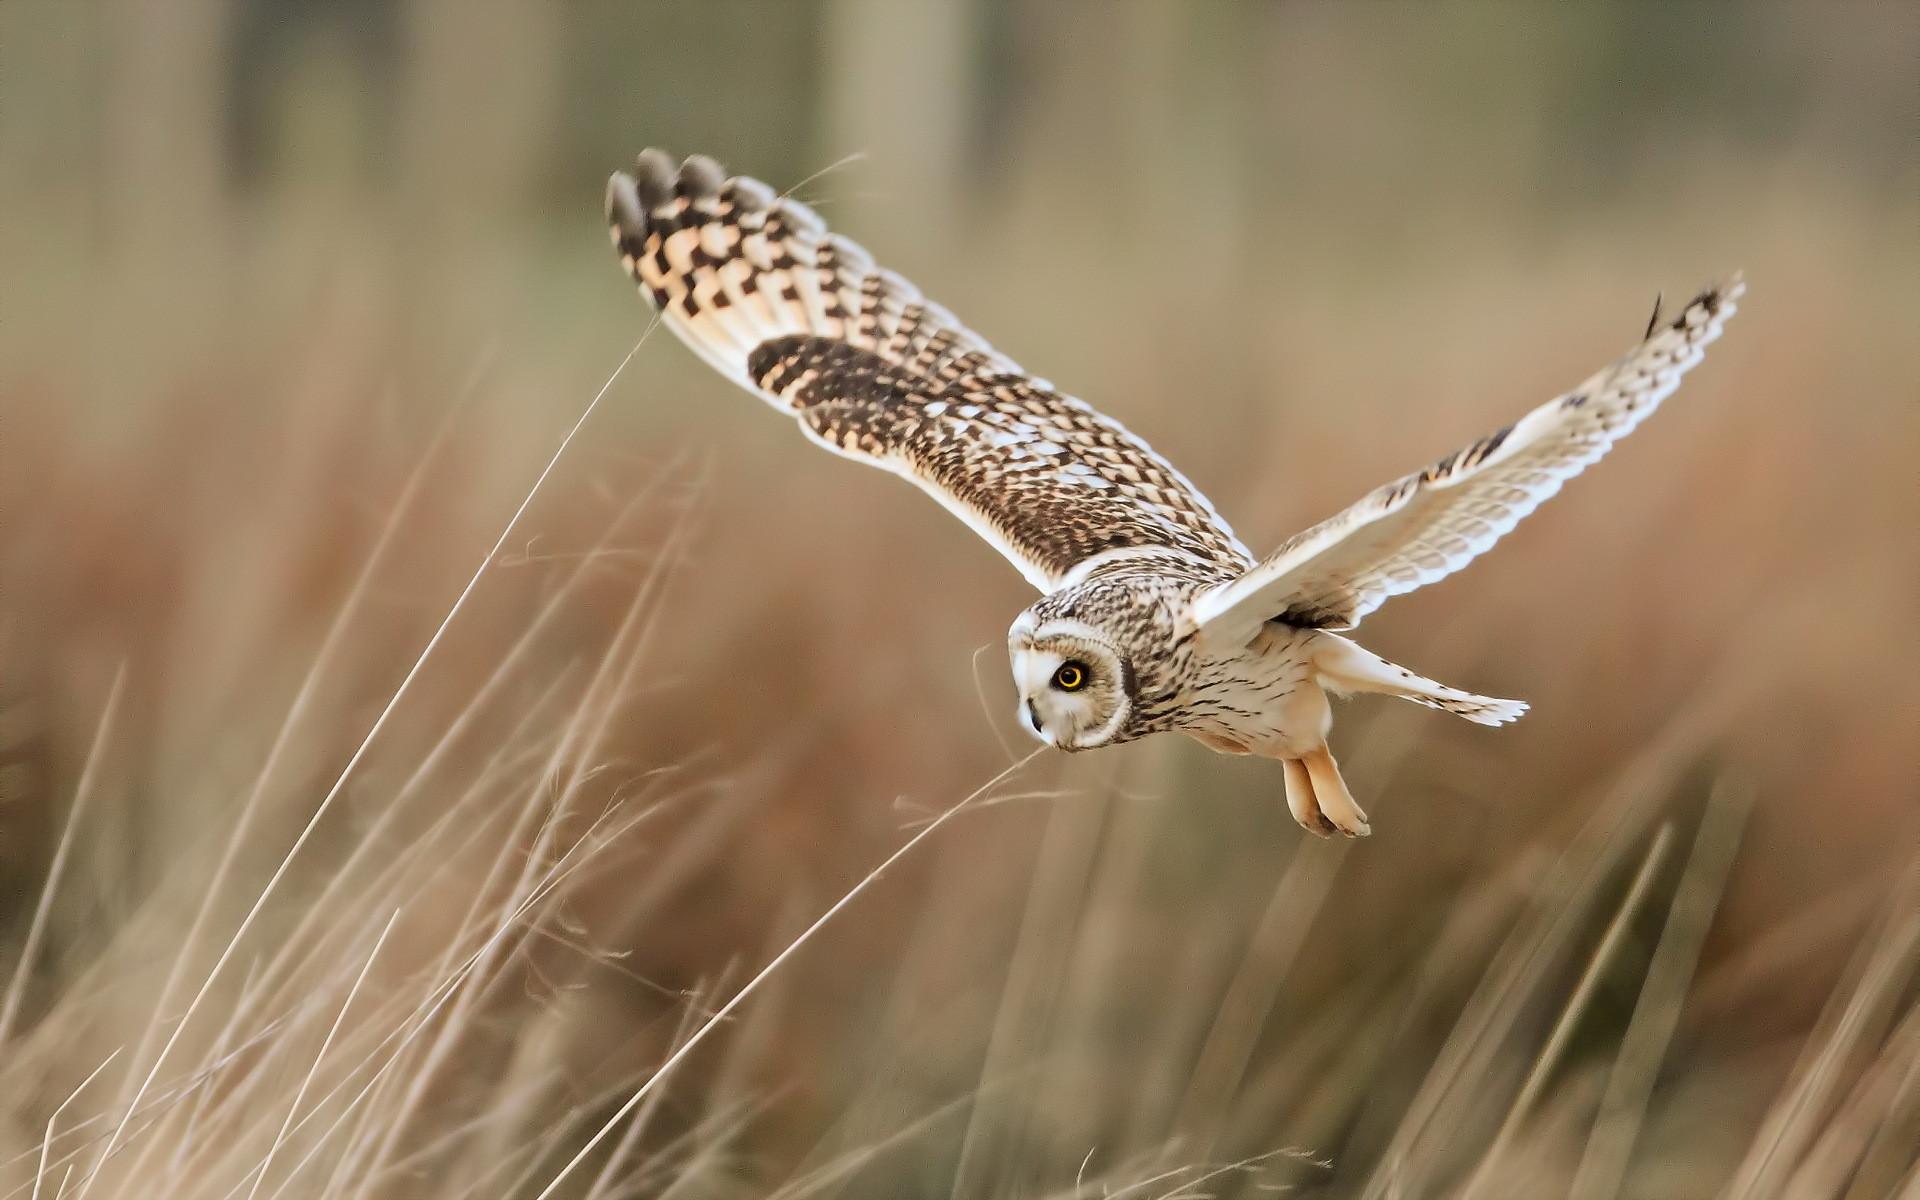 Flying Owl Wallpaper Background 2556